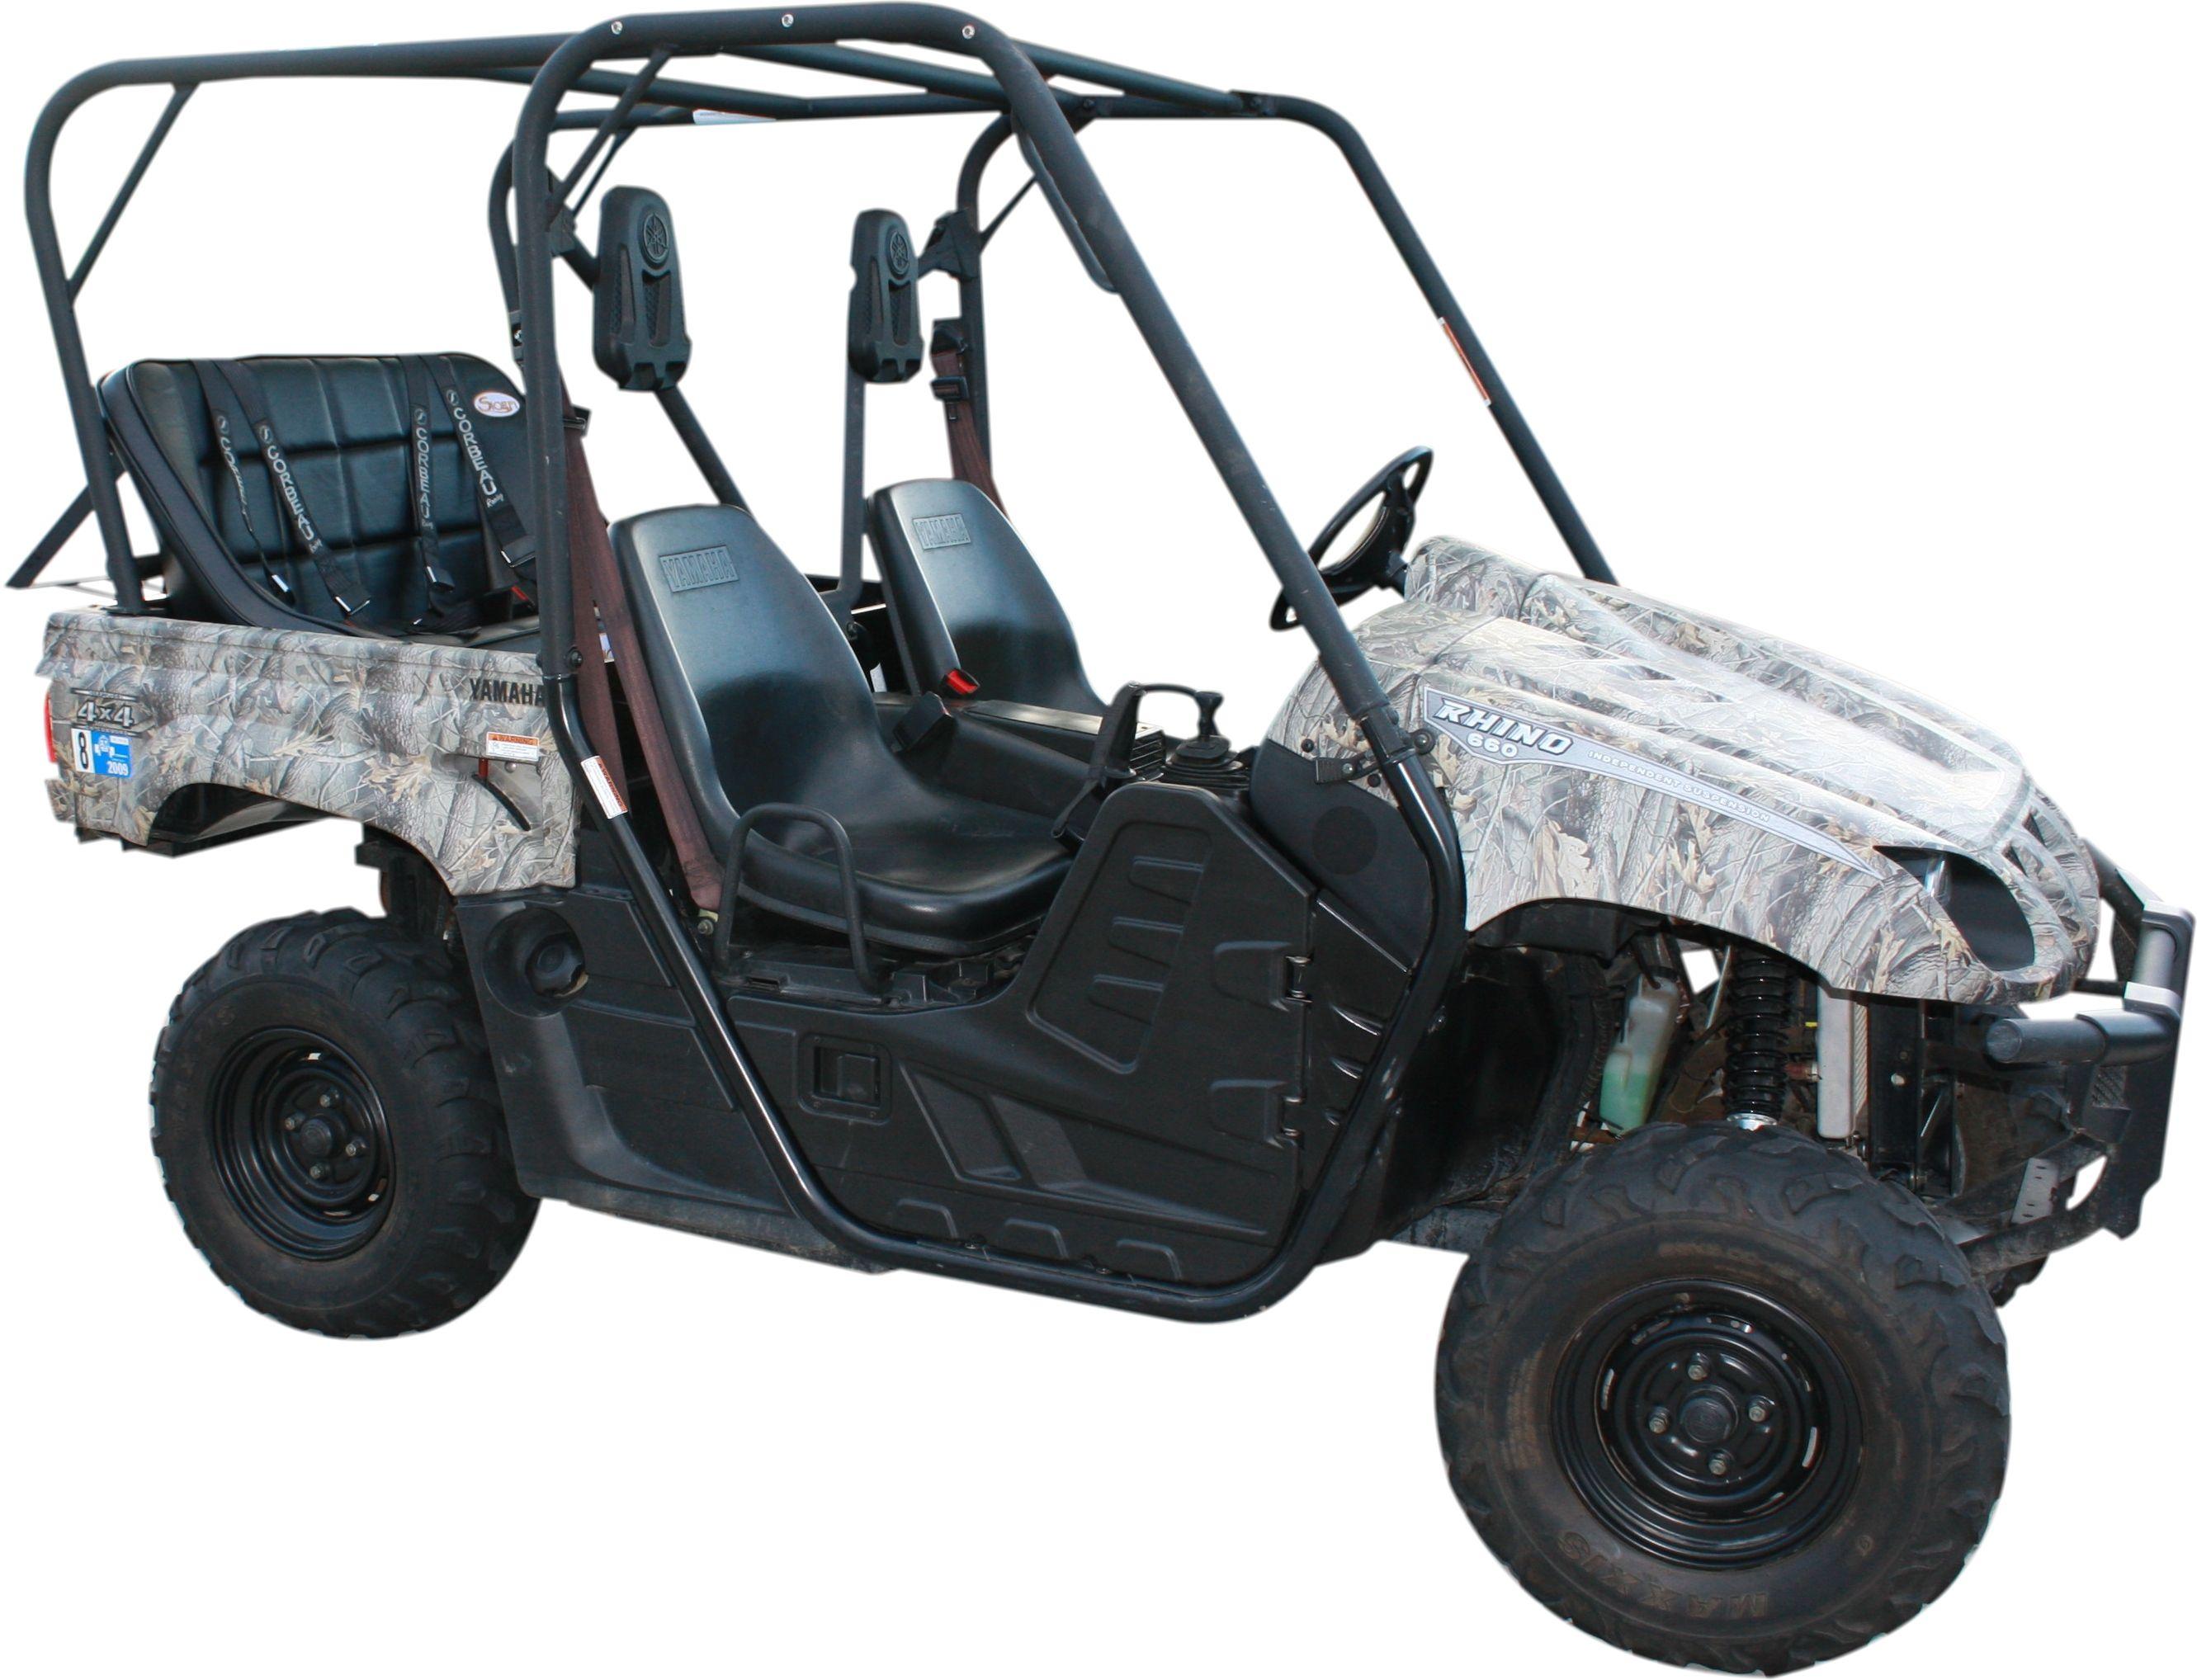 Yamaha rhino back seat and roll cage kit